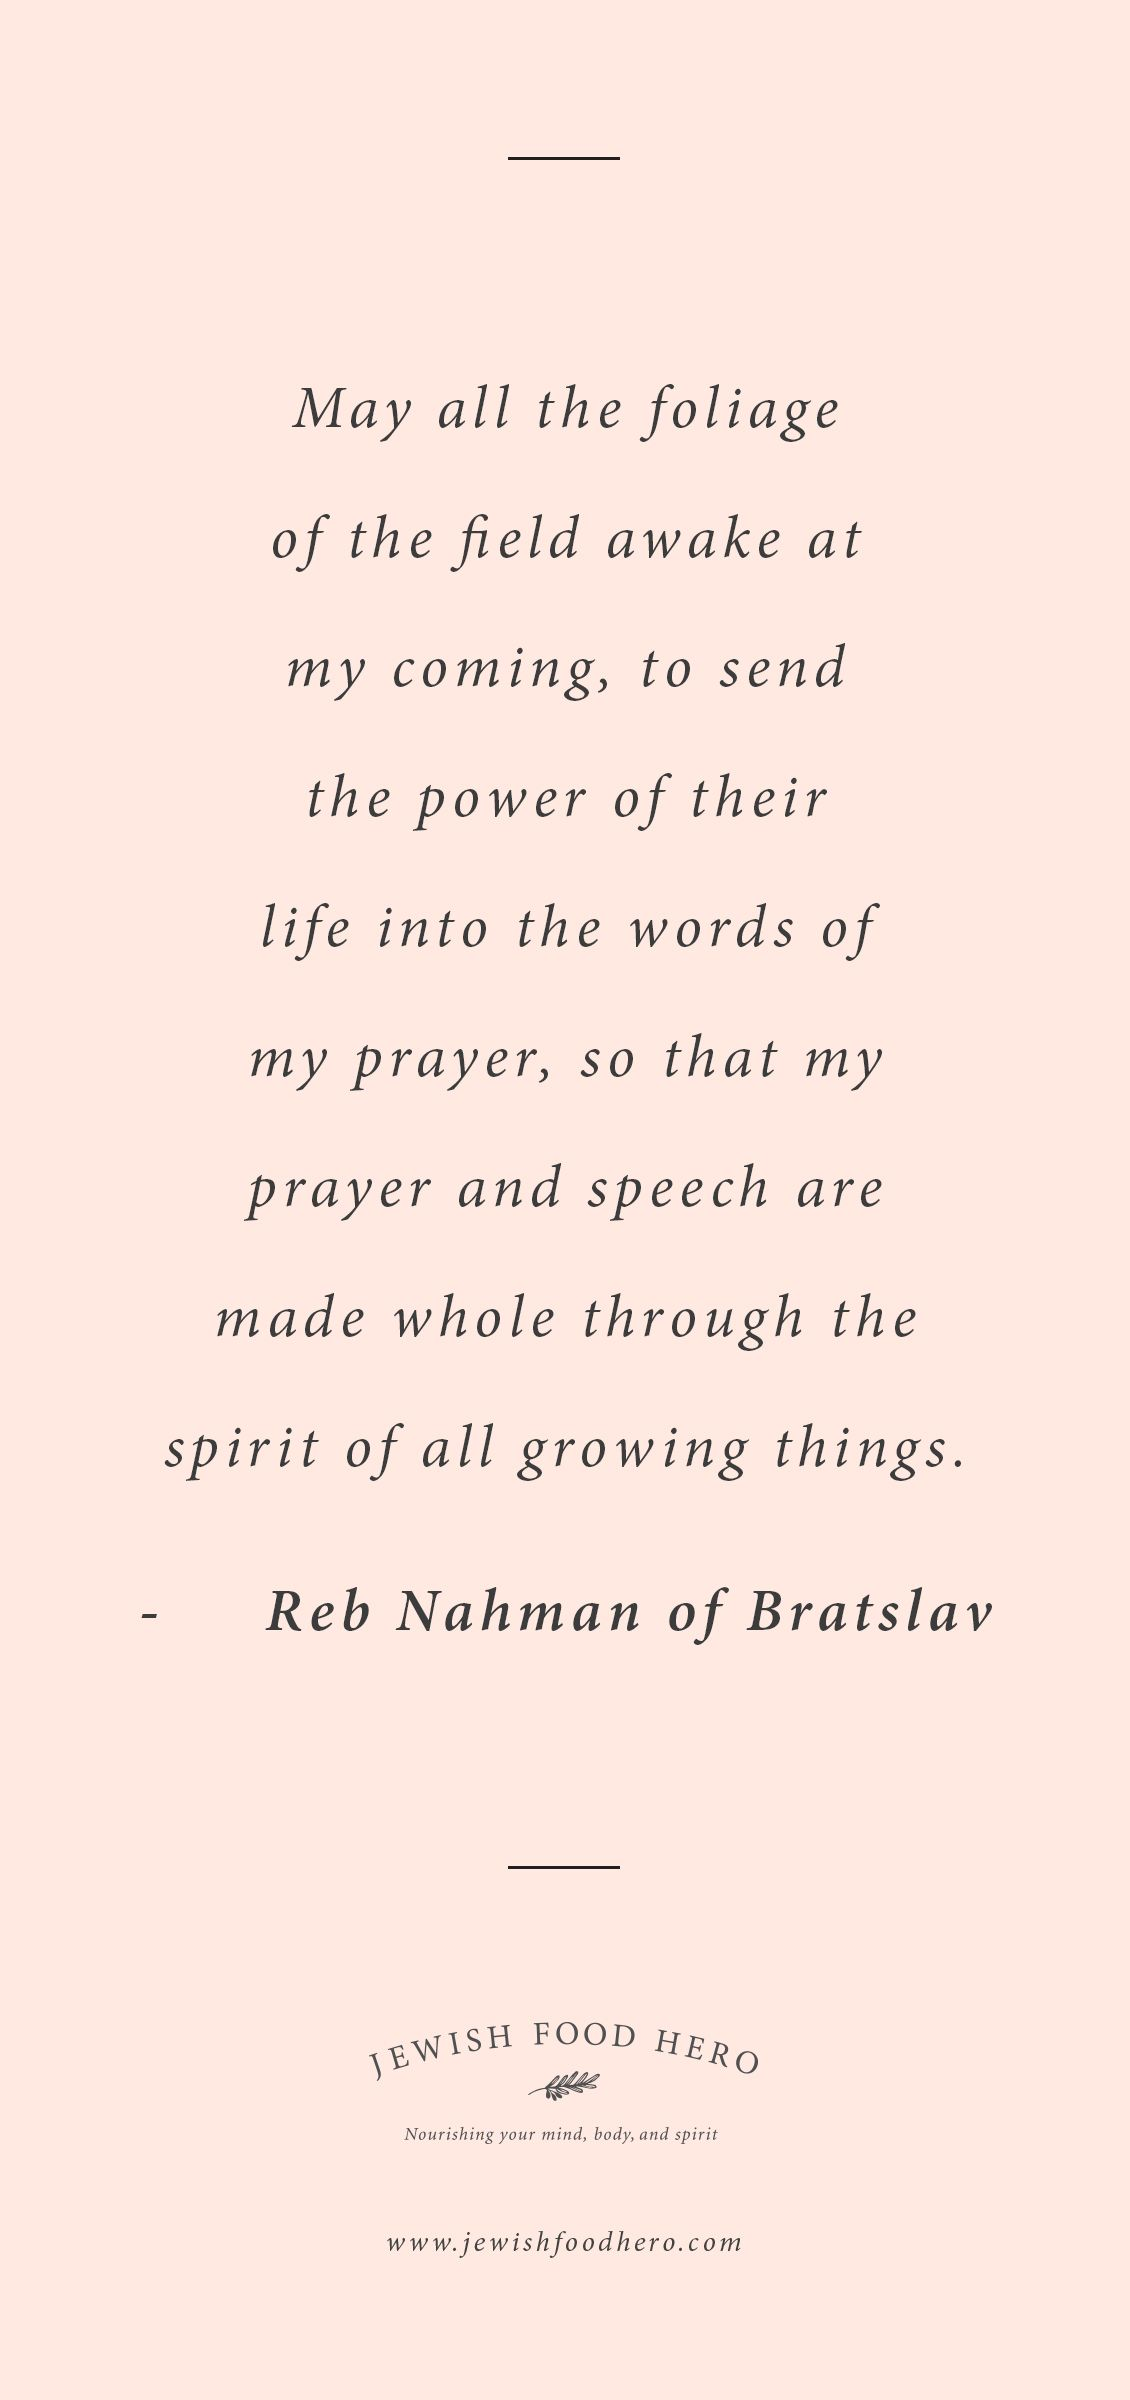 Shema israel bracelet israel bible jewish hebrew prayer kabbalah shma - Bible